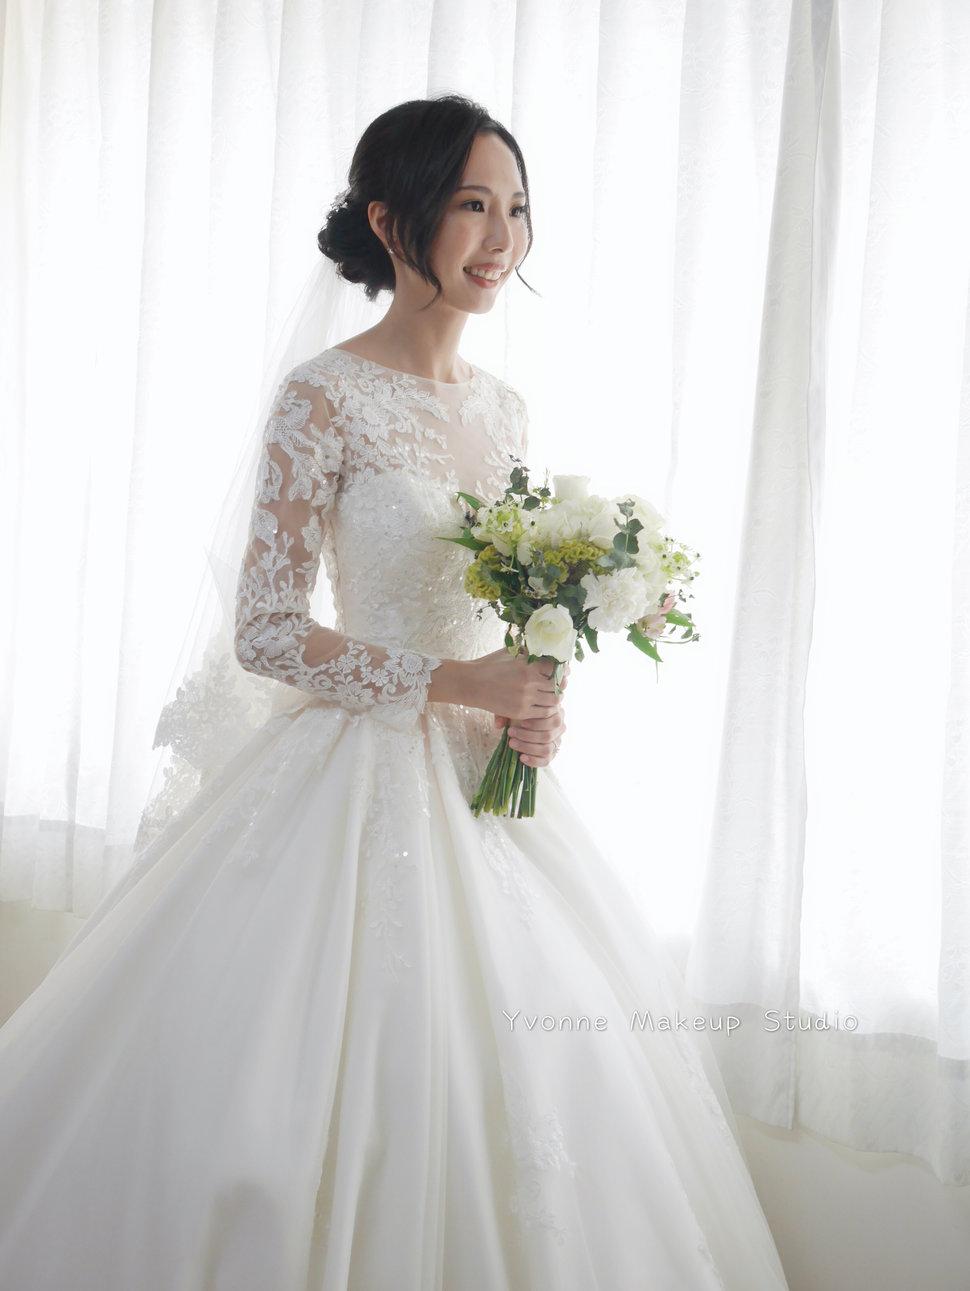 IMG_8608 - 做懂妳的新秘 Yvonne 嘉云《結婚吧》